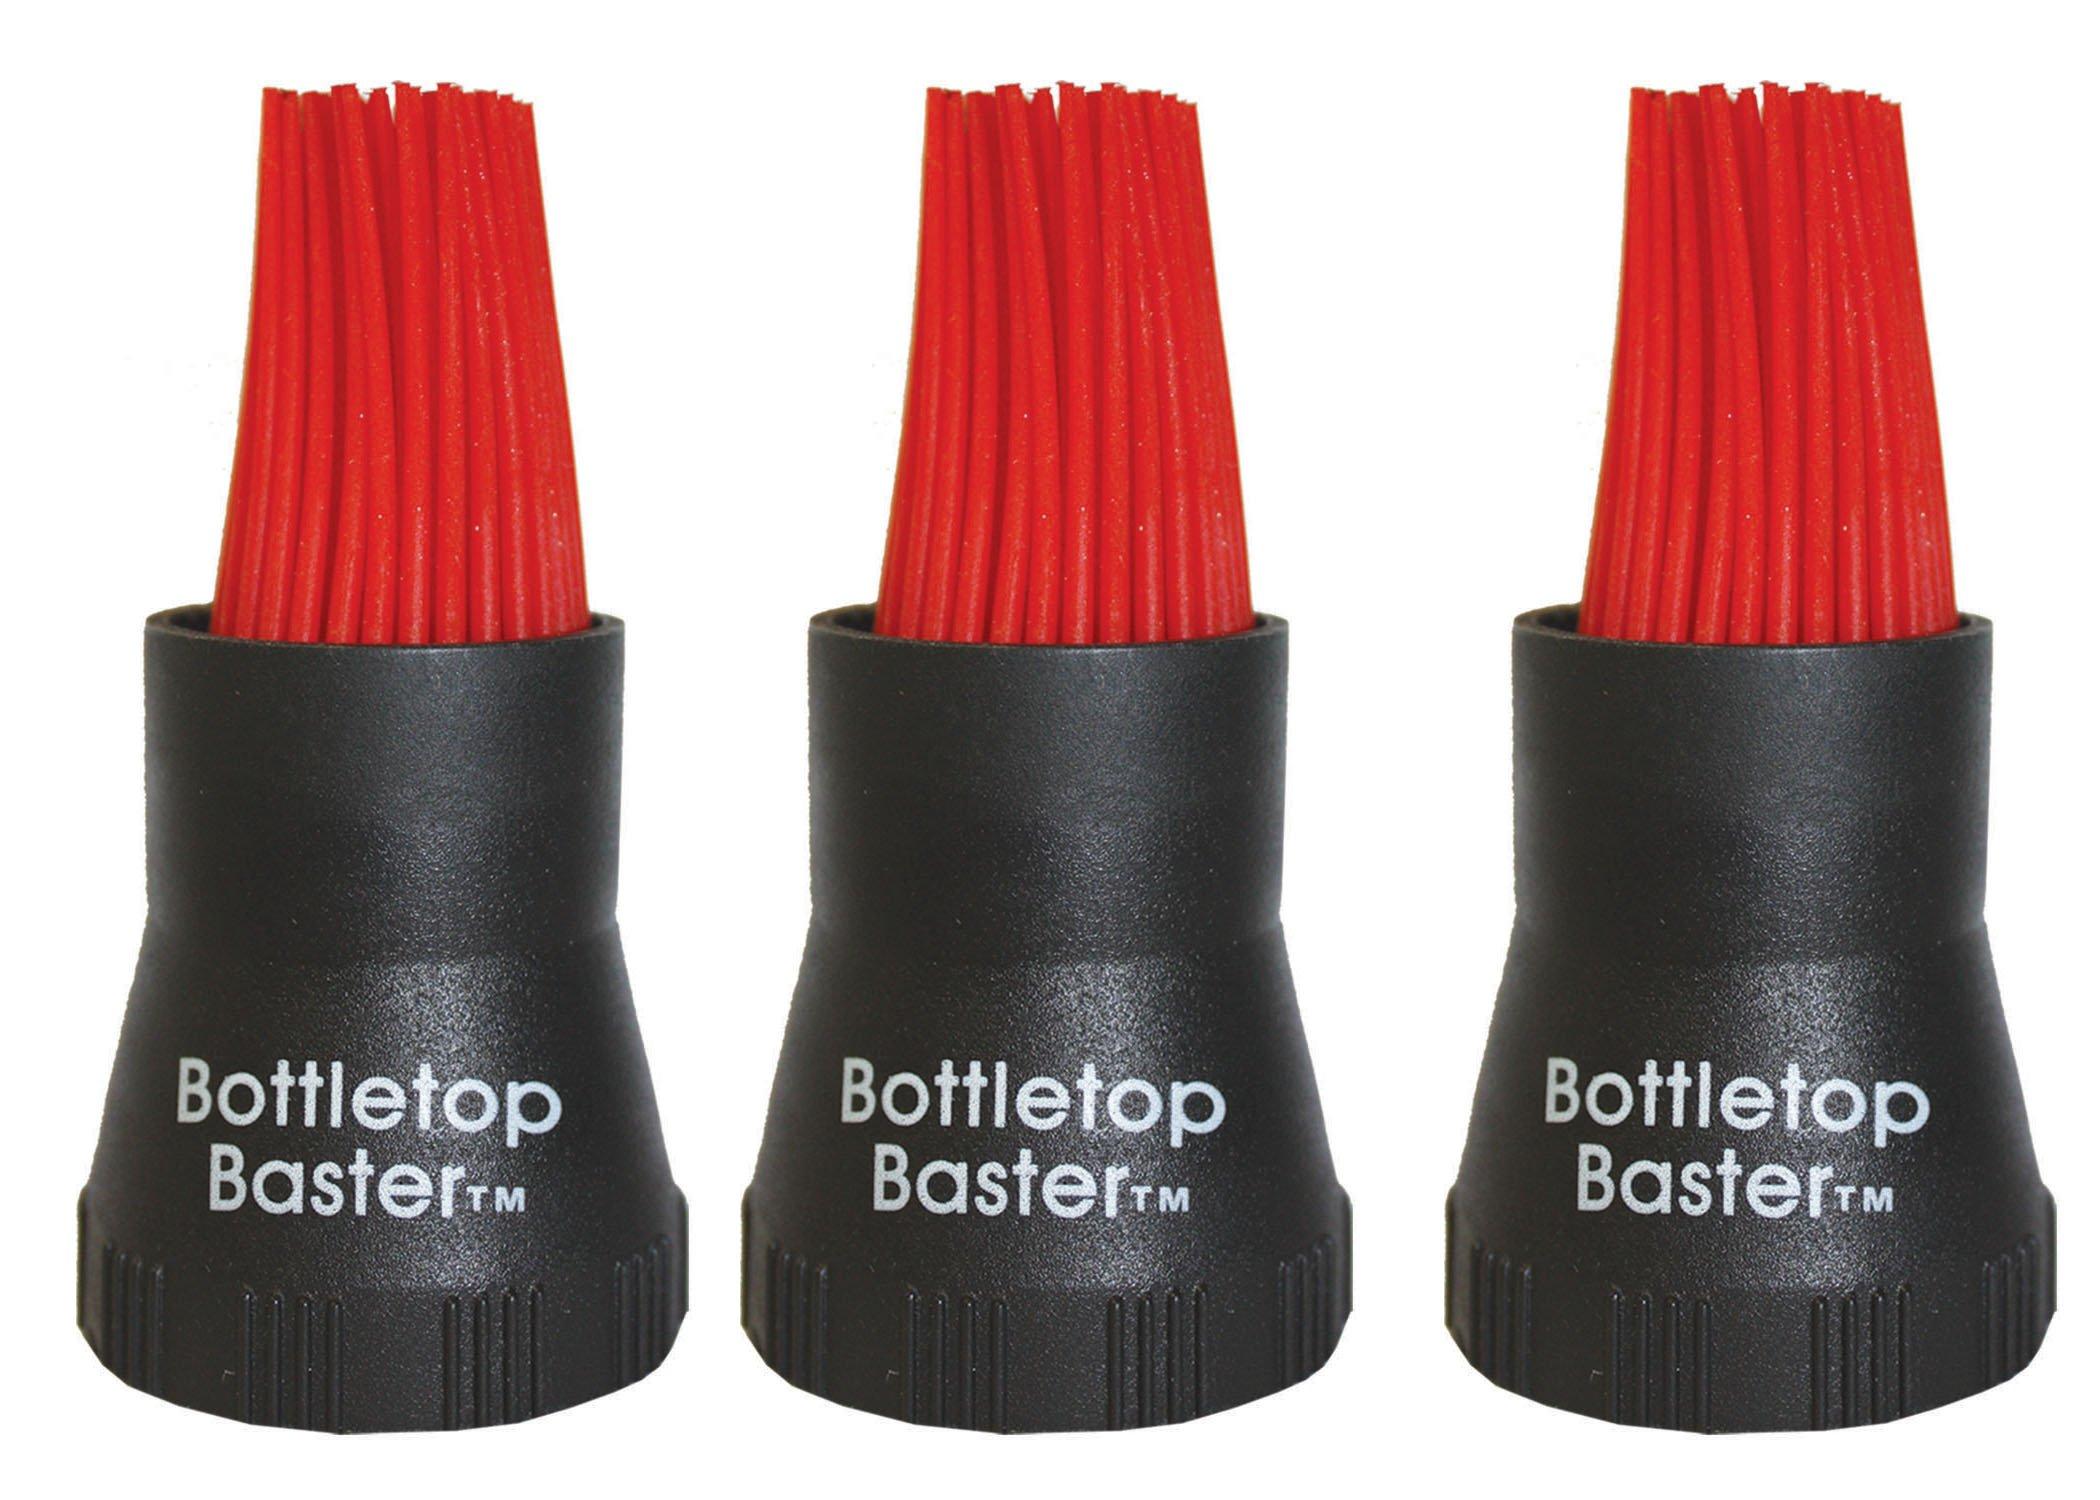 Jokari Crazy But It Works Silicone Bottletop BBQ Baster, Black, 3-Pack